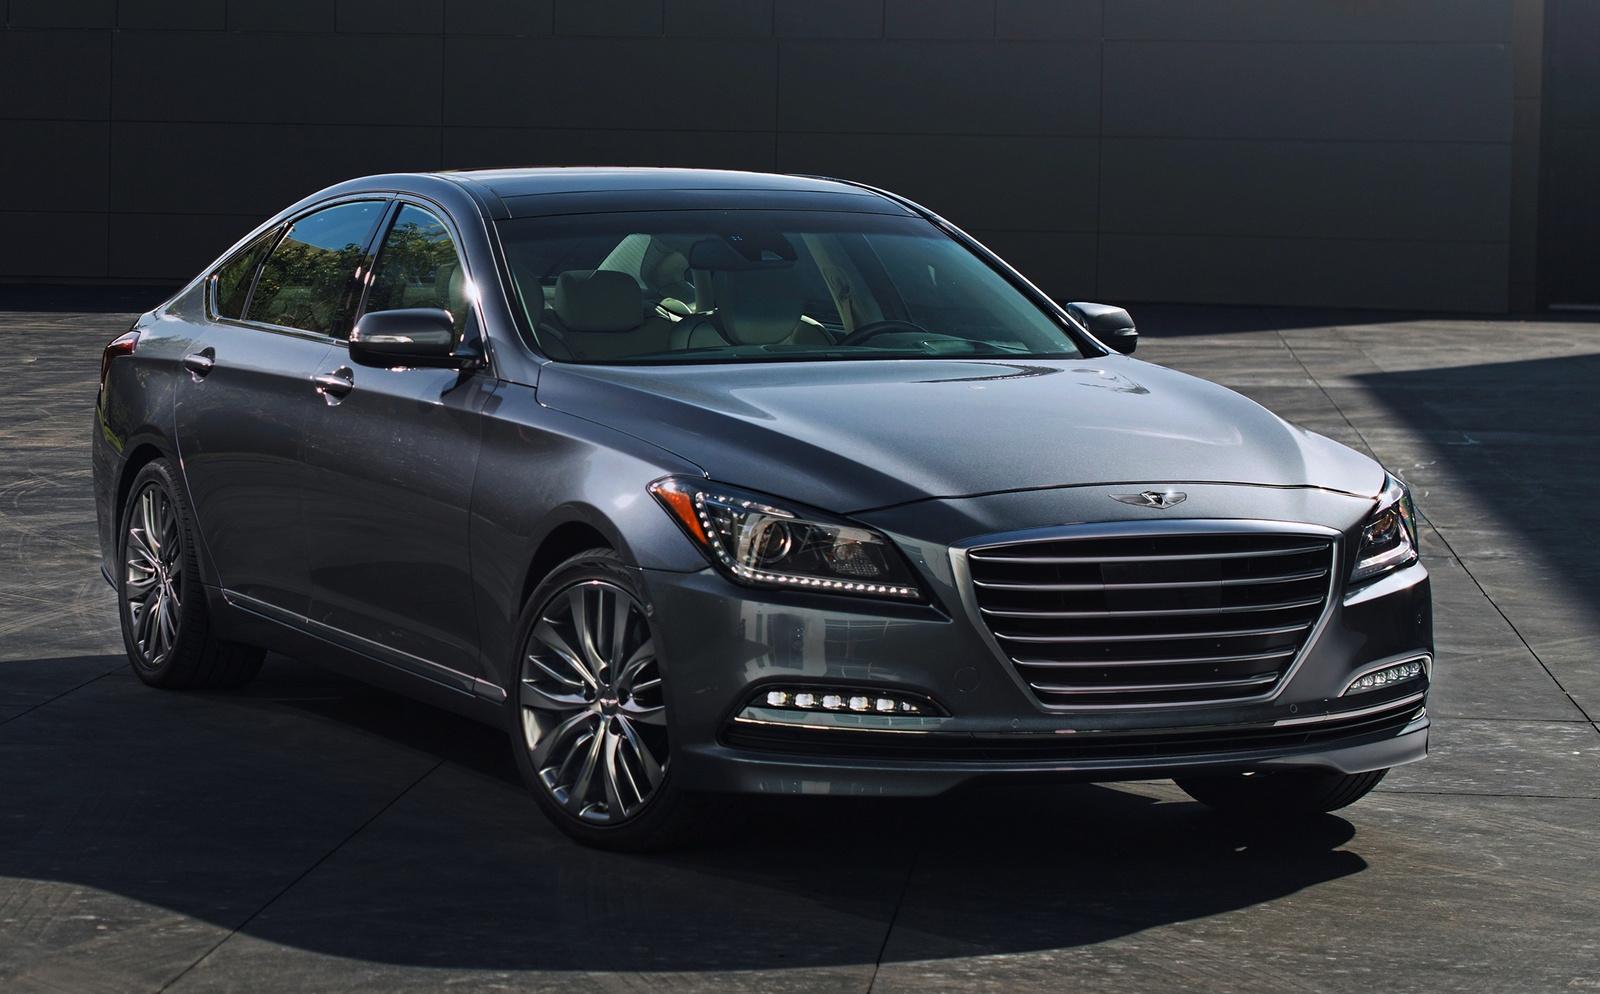 Hyundai Cars 2015 29 Car Desktop Background